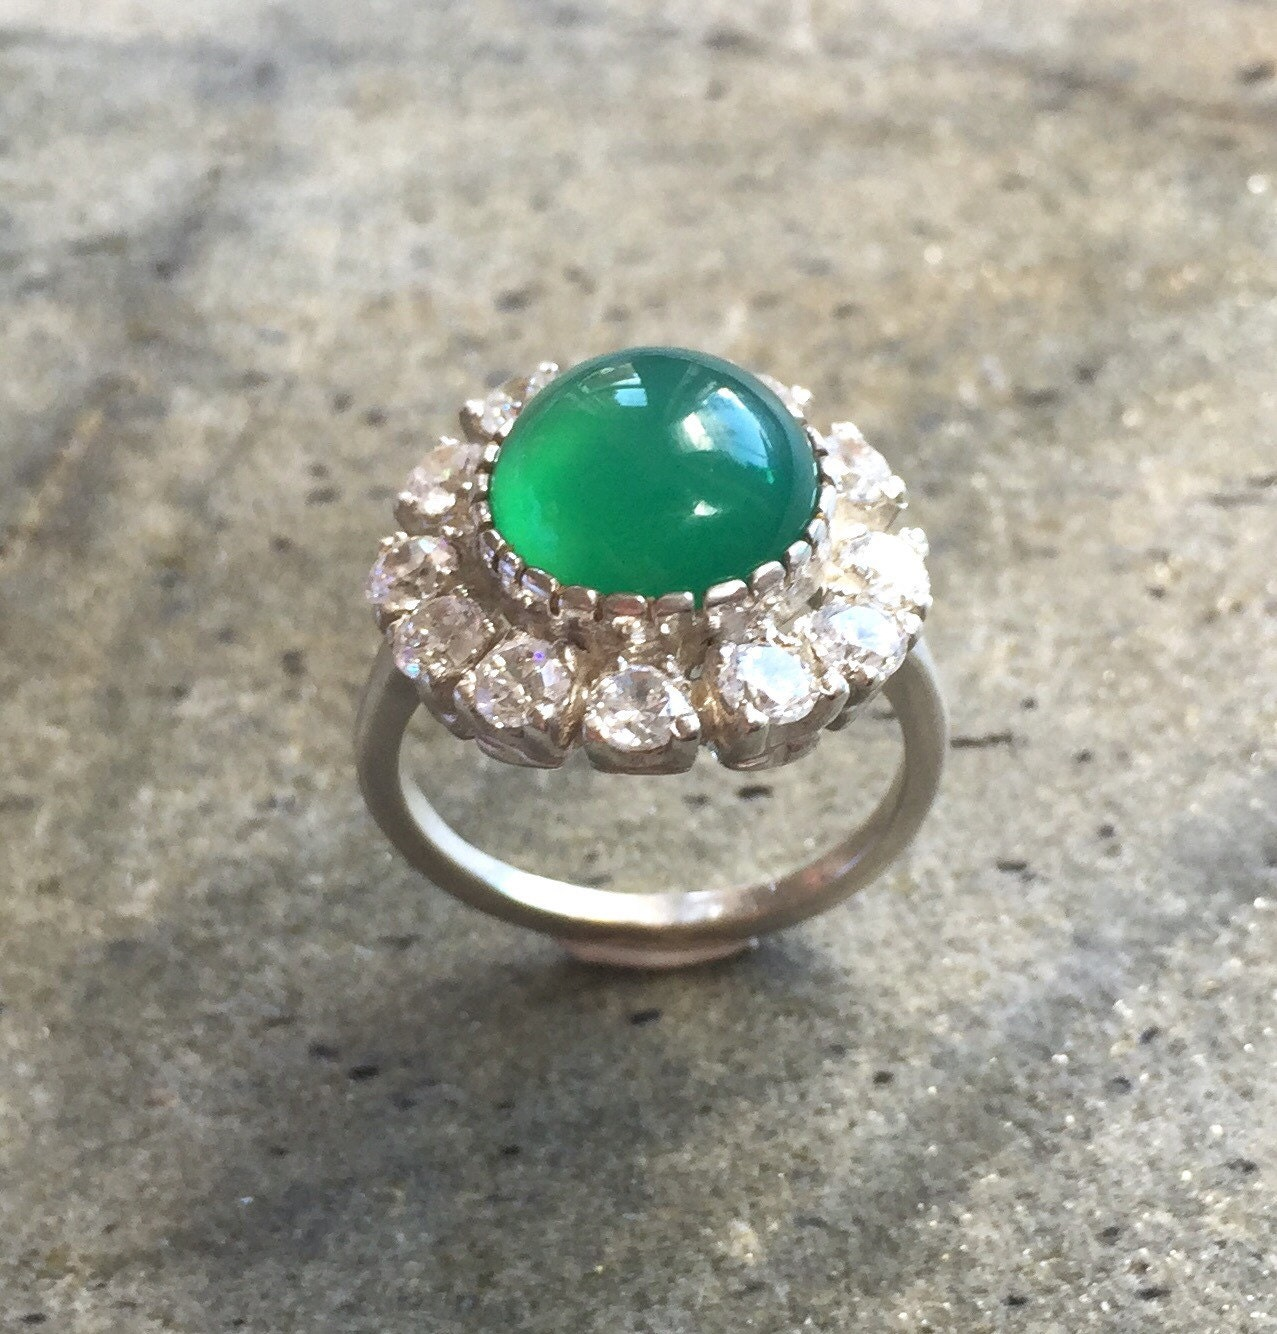 Emerald Ring Antique Ring Vintage Ring Antique Emerald Ring Antique Rings Sterling Silver Ring Green Vintage Ring